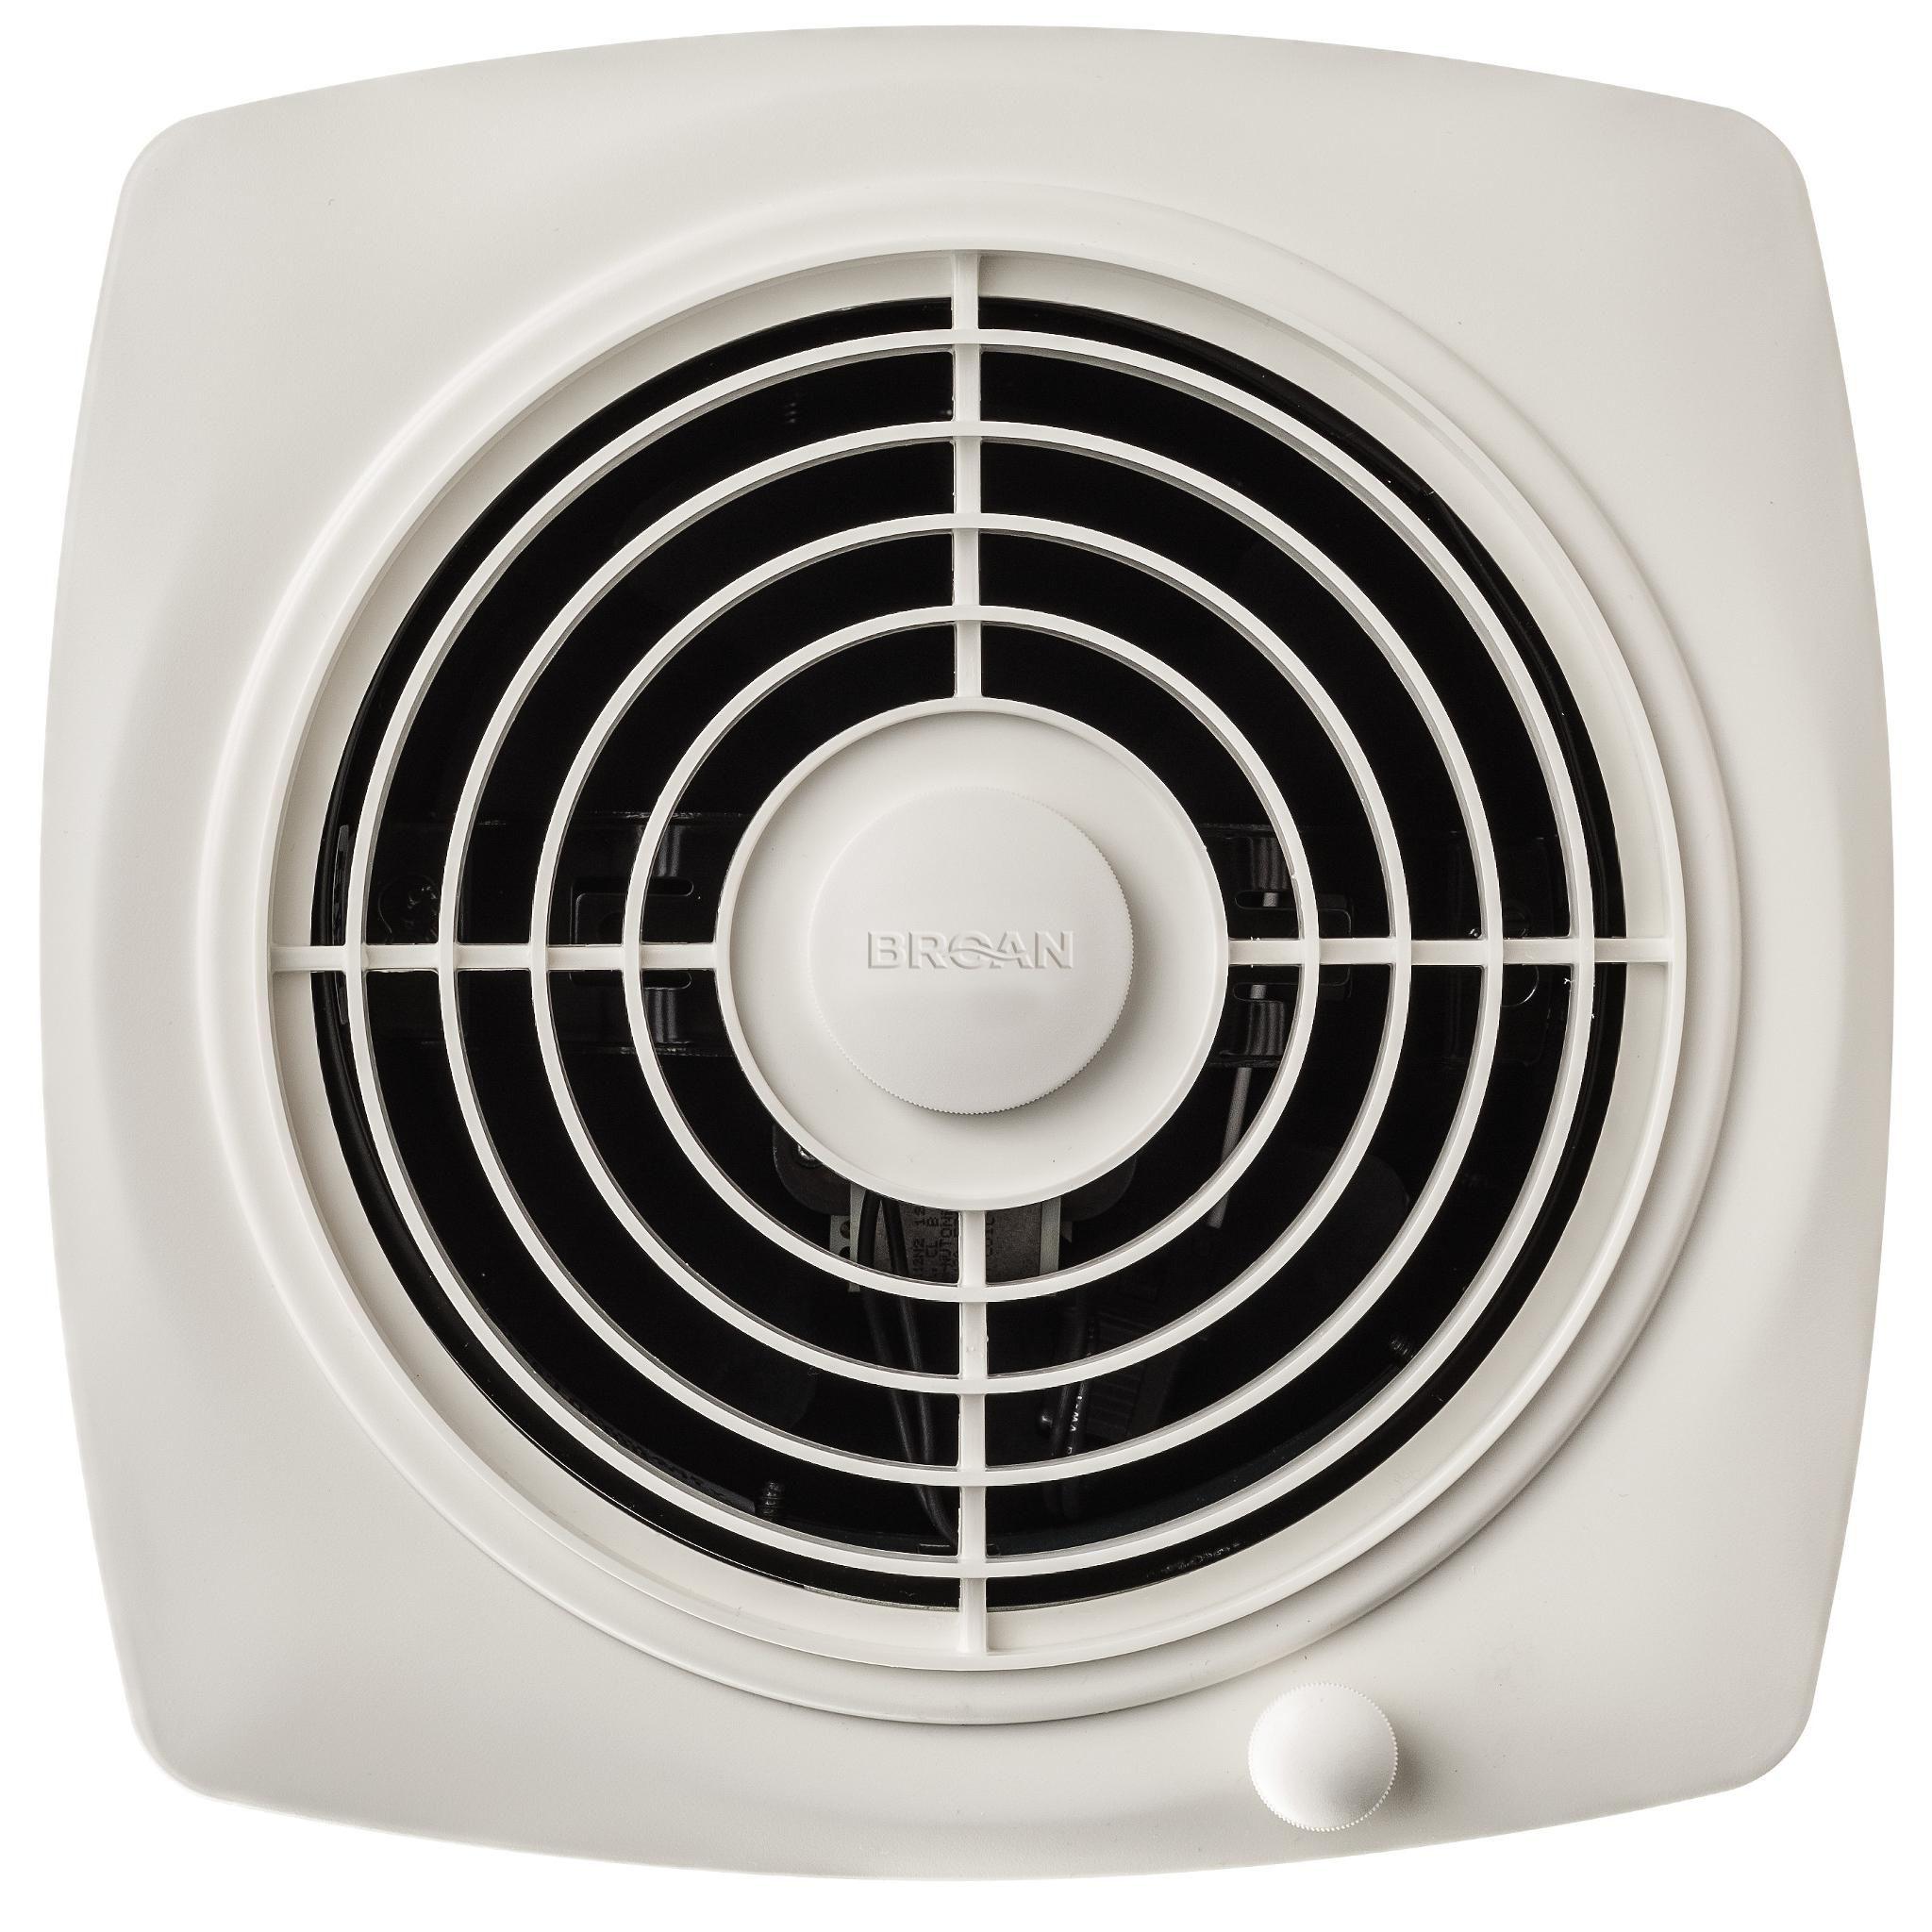 Best Bathroom Exhaust Fan Reviews For 2020 Bathroom Fan Bathroom Exhaust Fan Exhaust Fan